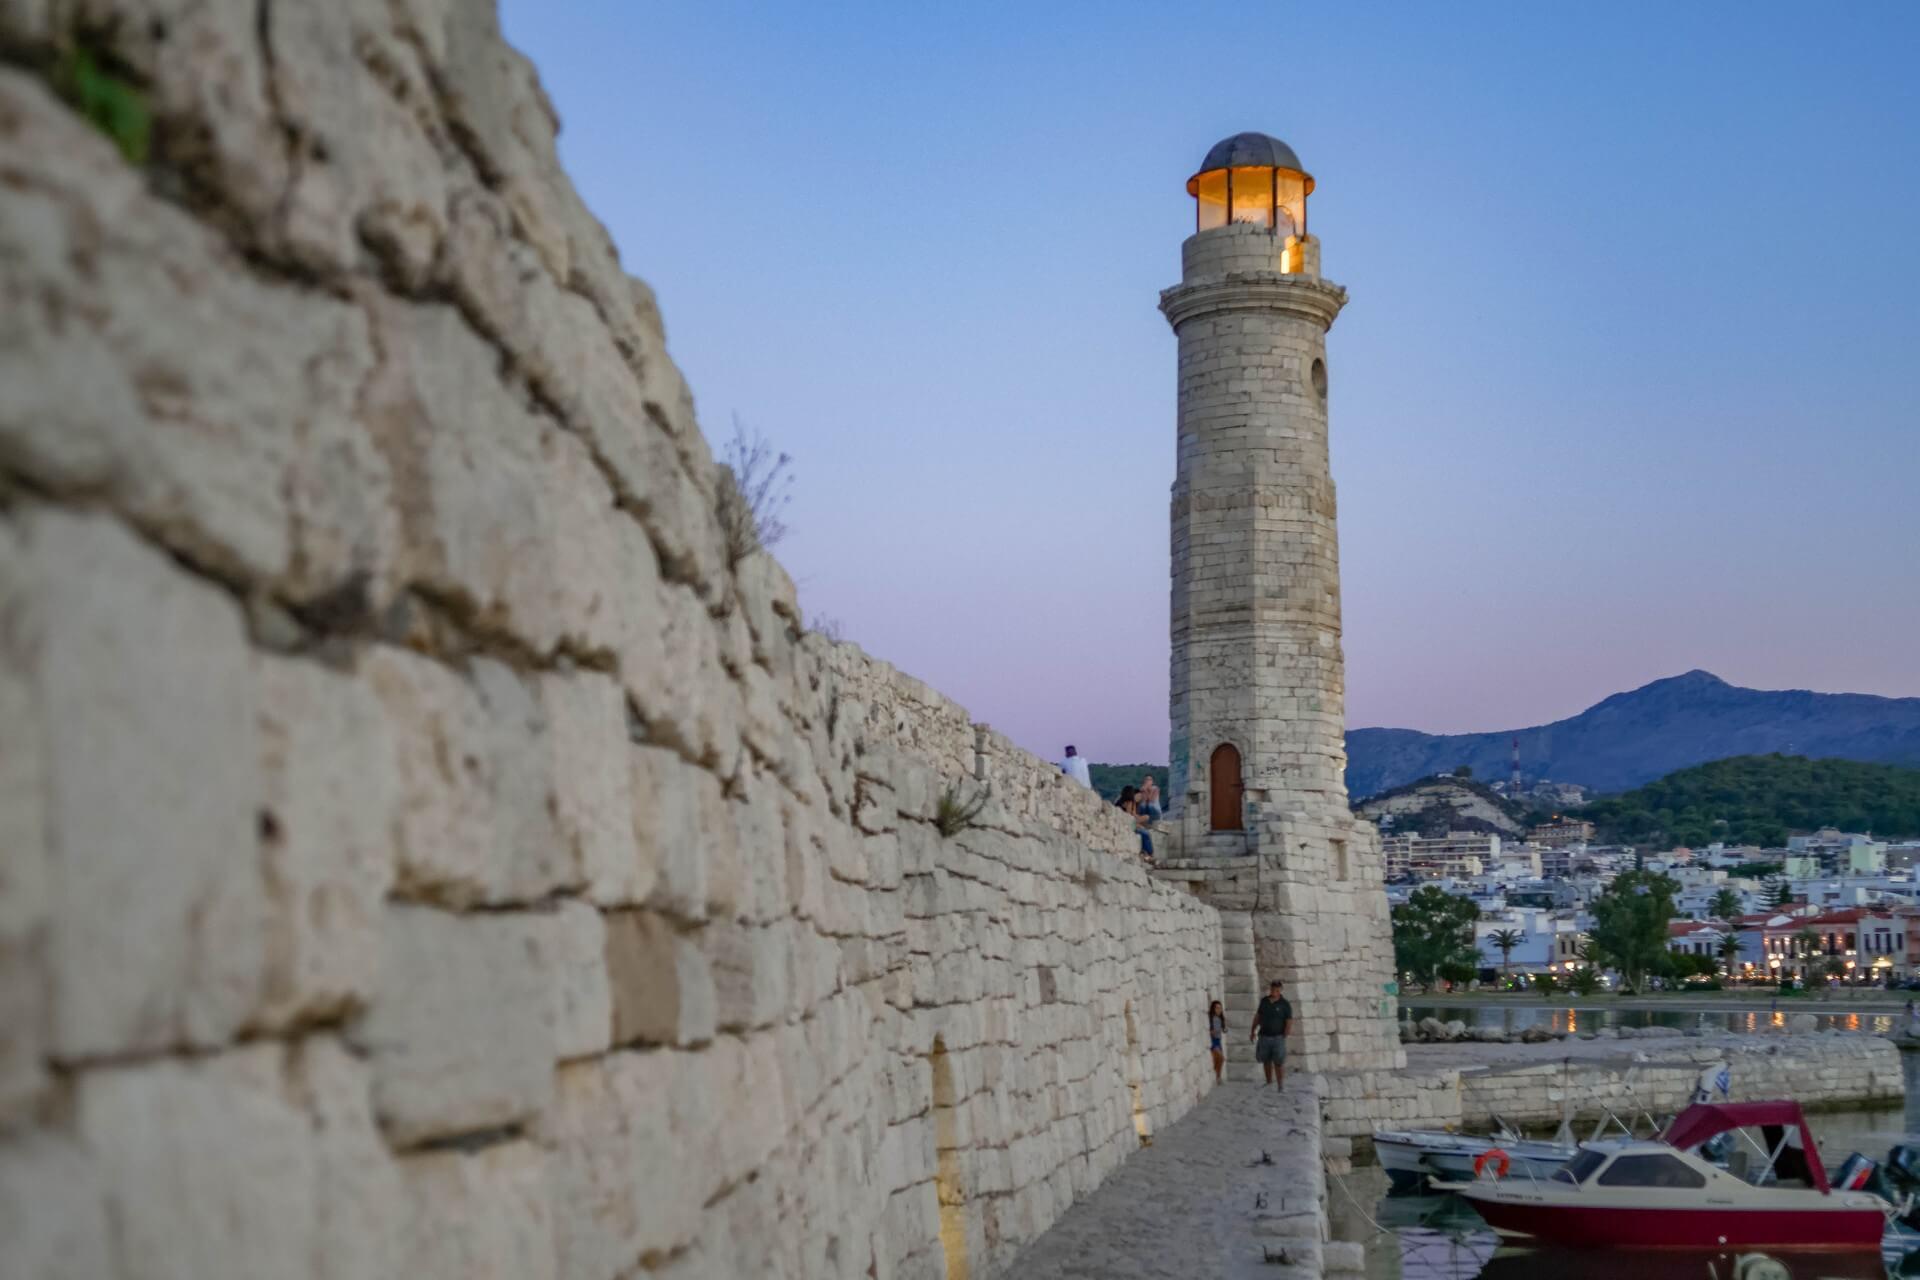 Rethymno Lighthouse in Venetian Port Crete - Copyright Allincrete.com